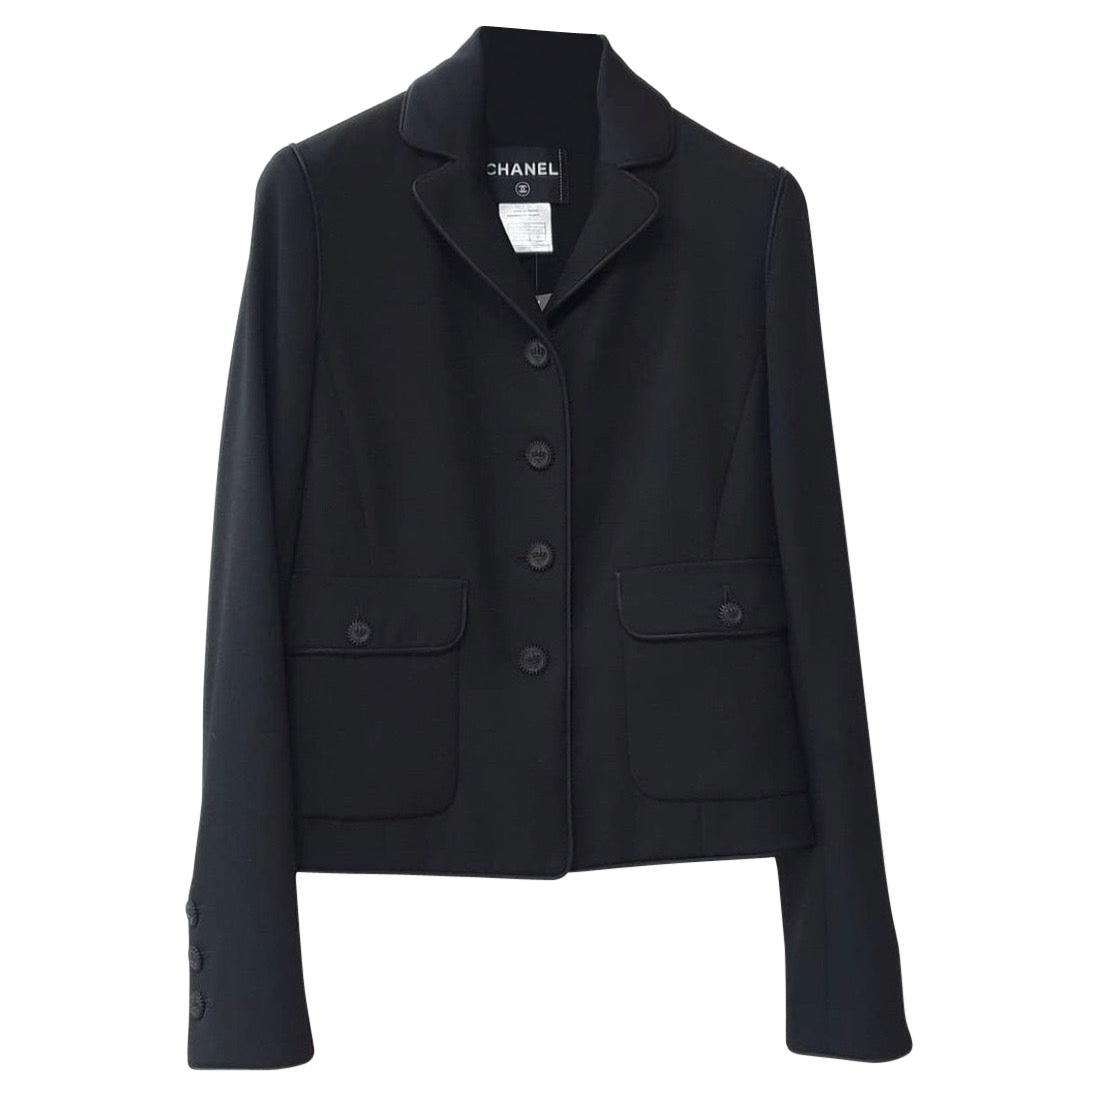 Chanel 2008 Black Wool Blazer Jacket